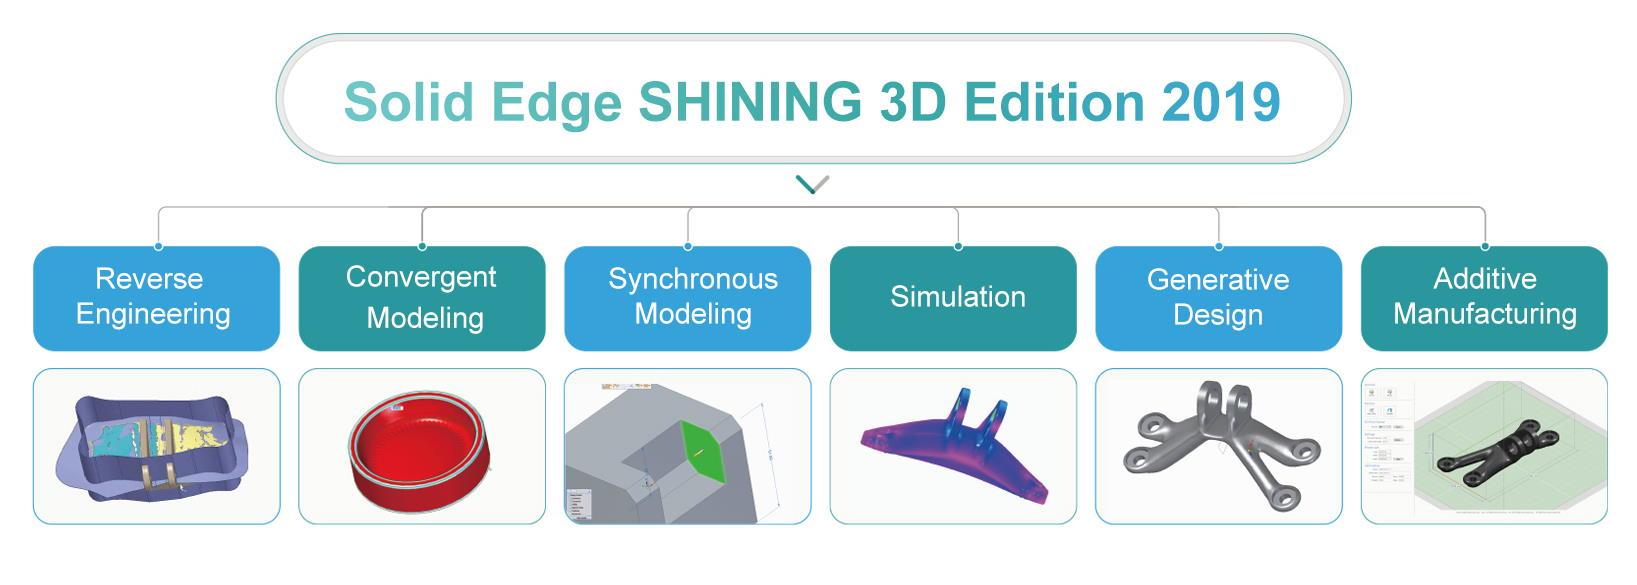 Solid Edge Shining3D